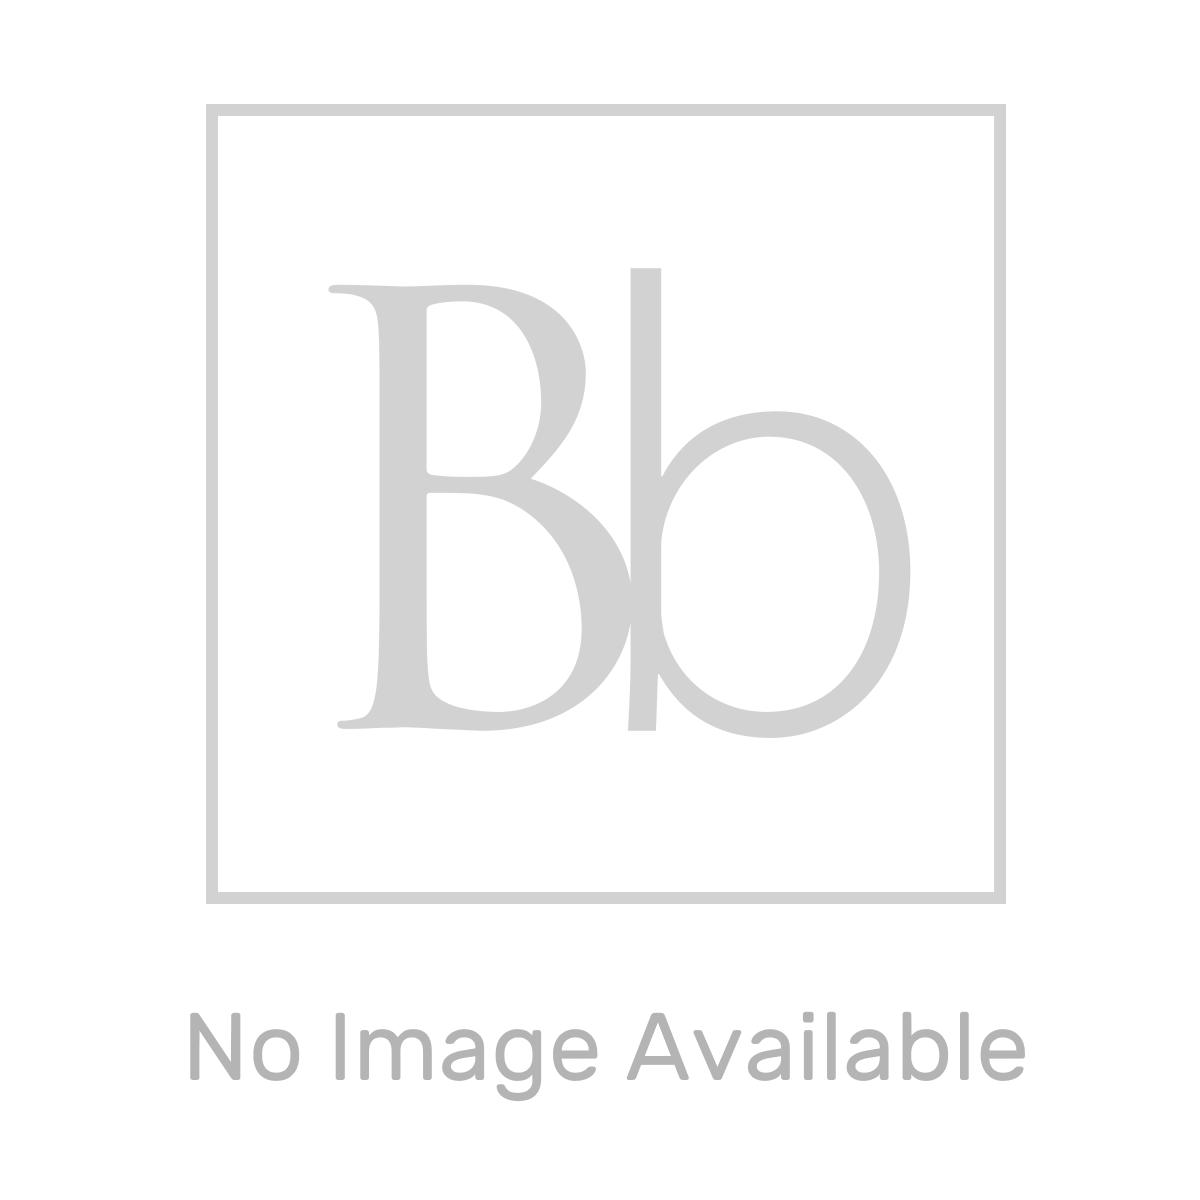 RAK Washington Grey Vanity Unit with Black Countertop 600mm